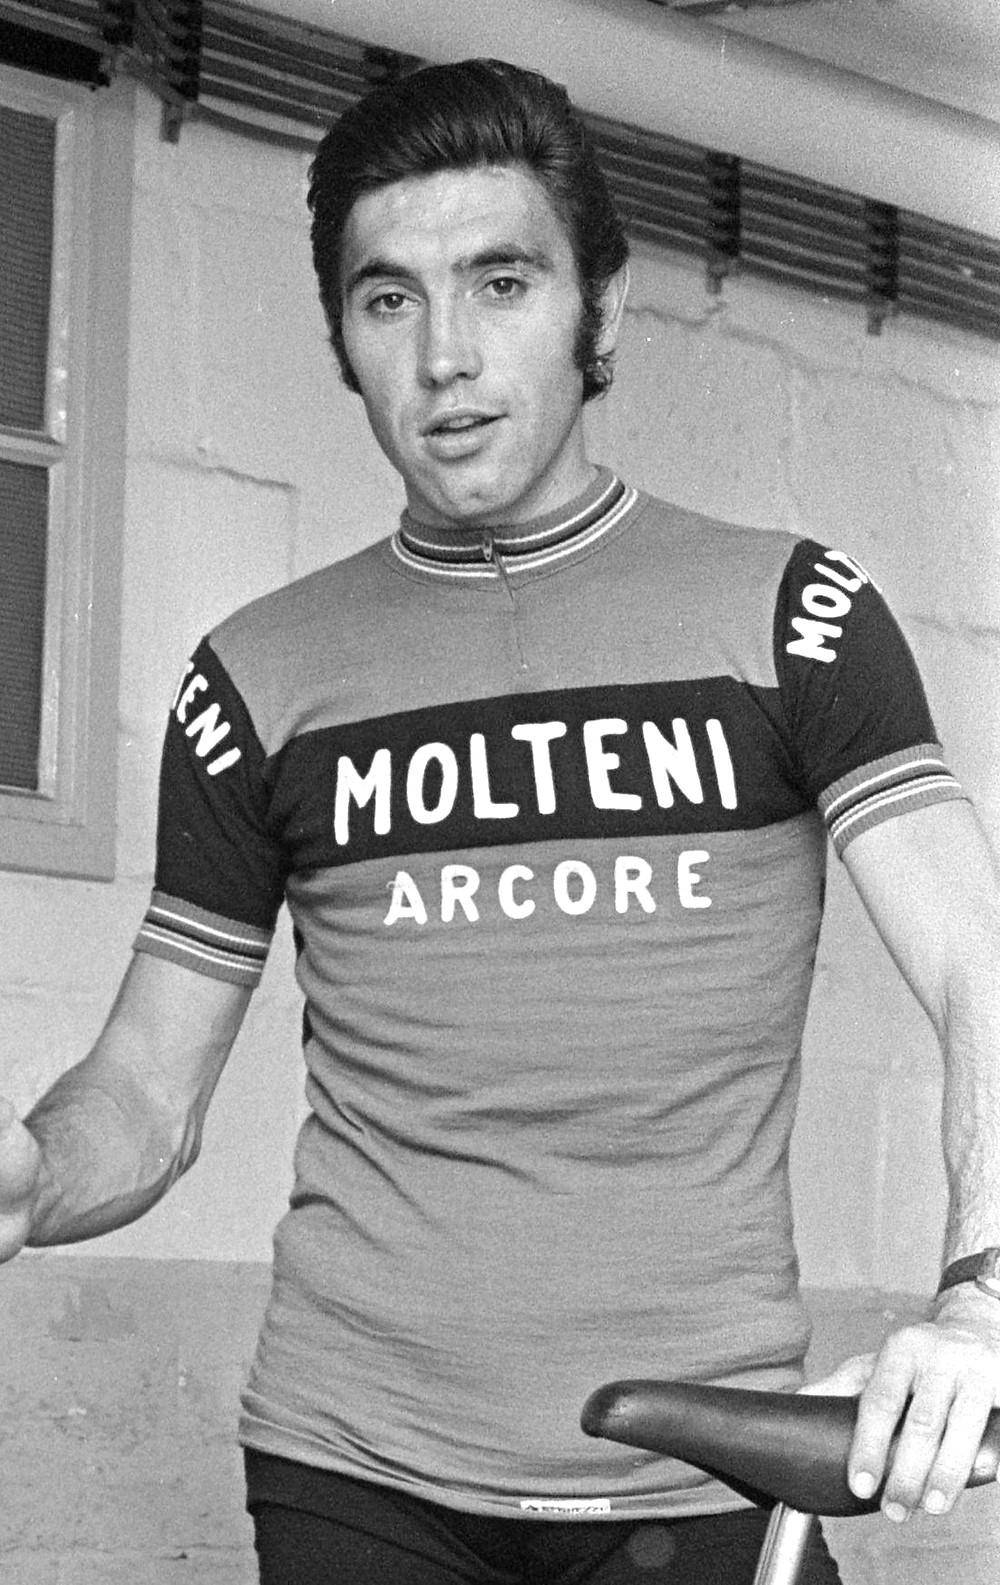 Eddy Merckx, Tour de France, Giro D'Italia, Vuelta d'espana, cycling, molteni, world champion, UCI, Belgium, Bruges